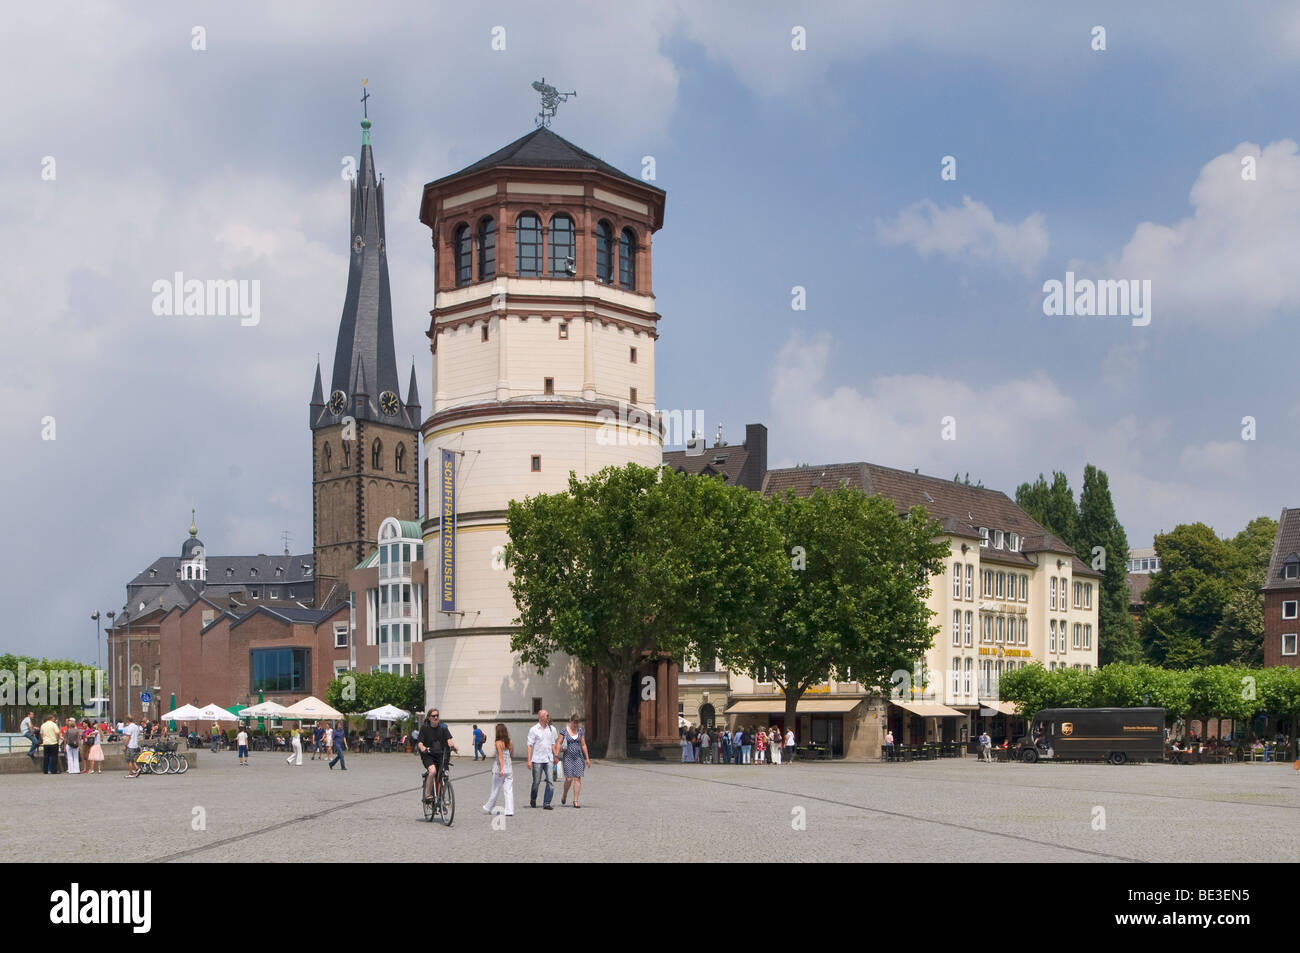 Duesseldorf Rhine bank, historic centre, Burgplatz Square and Lambertuskirche Church, North Rhine-Westphalia, Germany, - Stock Image